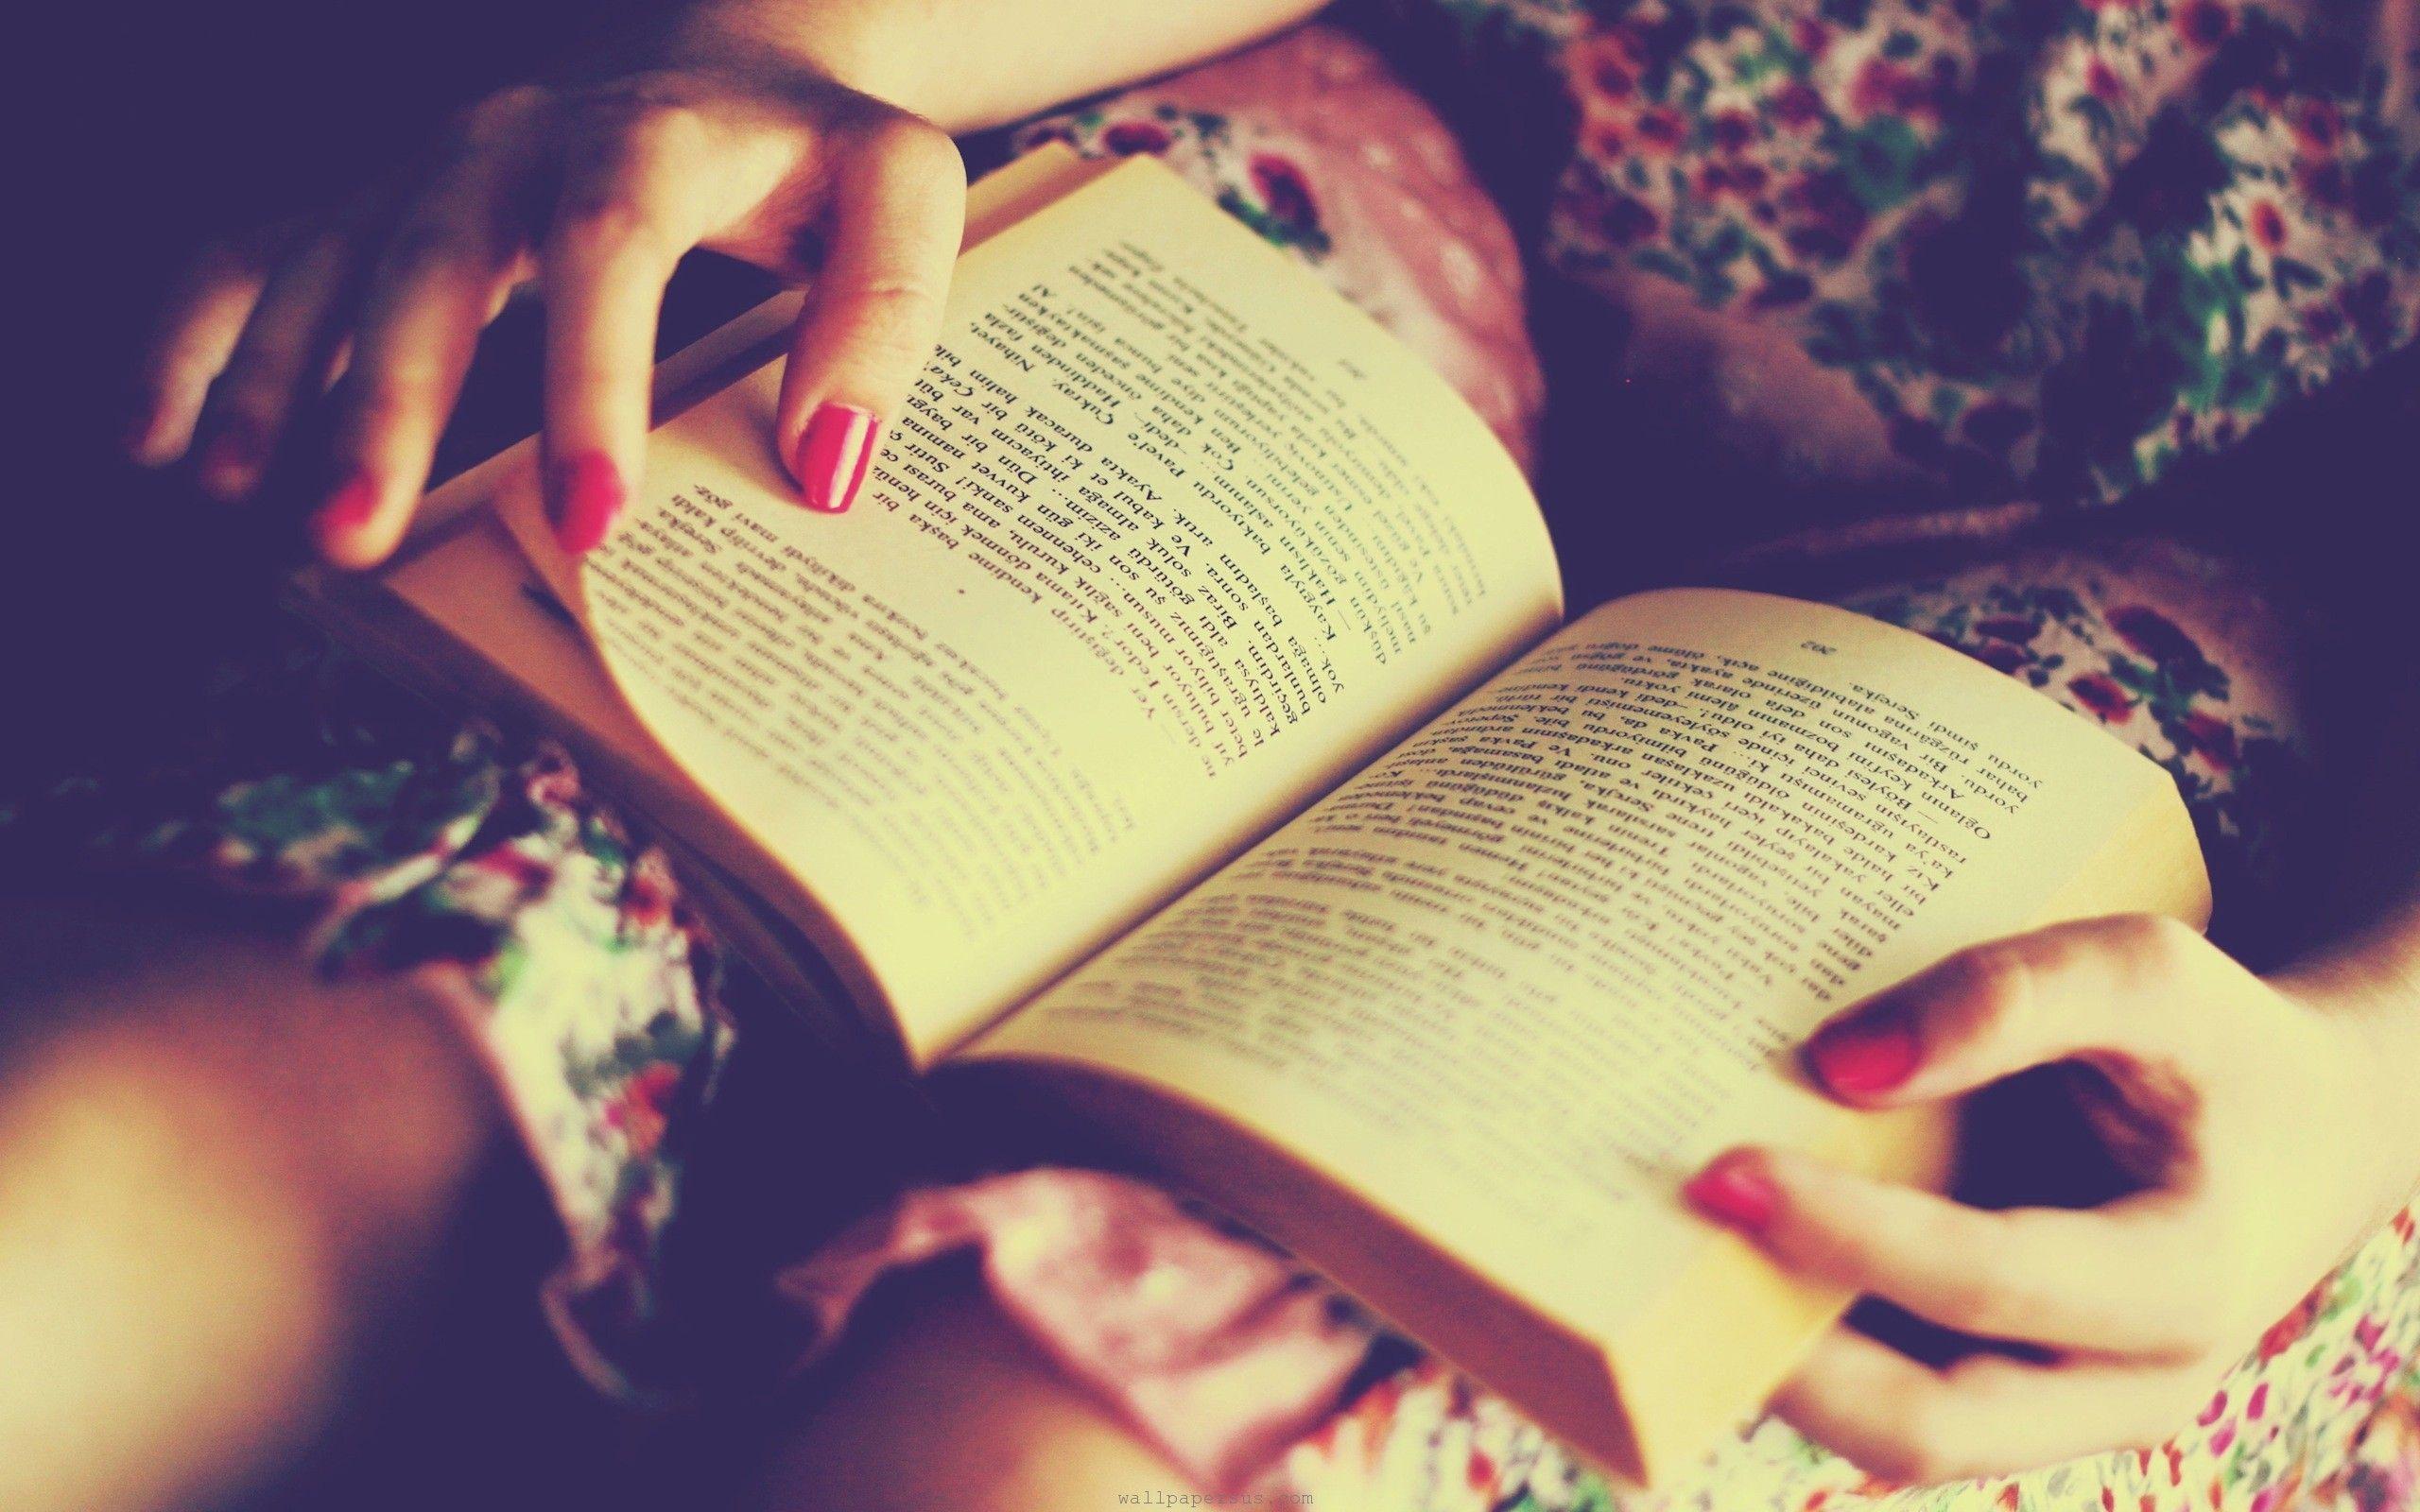 Resultado de imagen de girl books tumblr